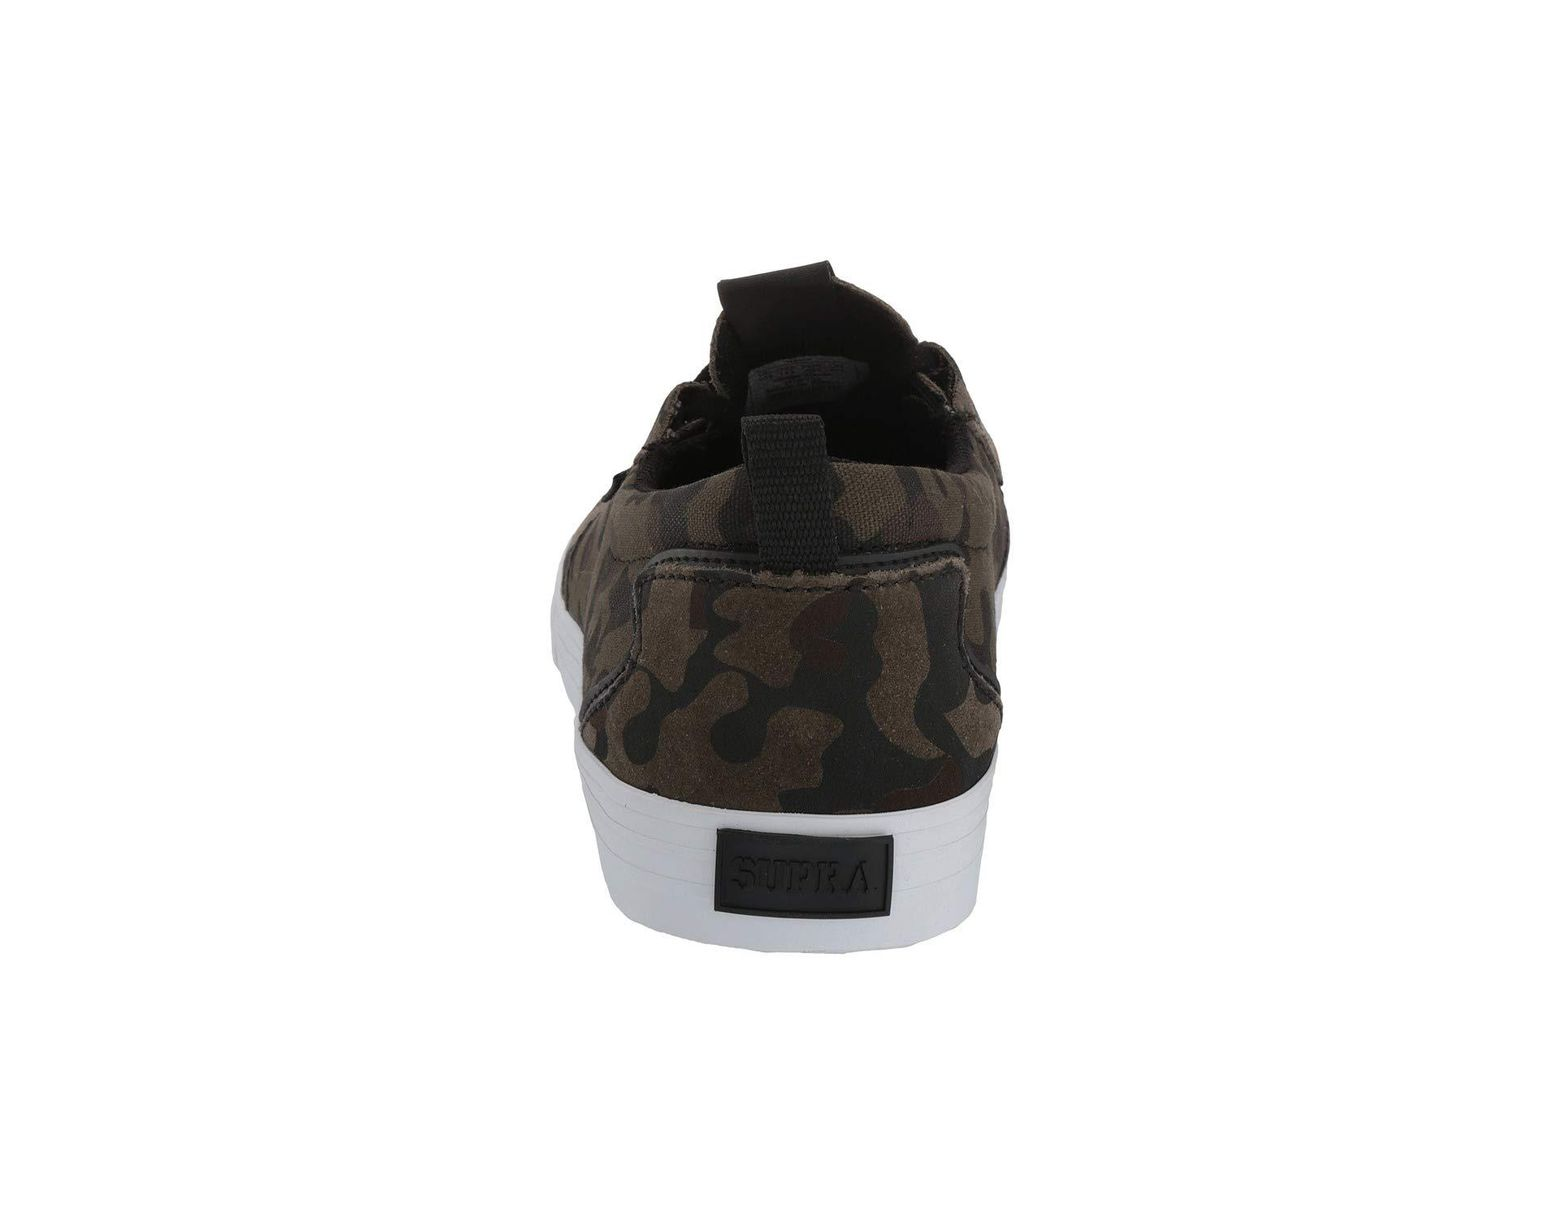 c6f021a3b79 Lyst - Supra Flow (camo white) Men s Skate Shoes for Men